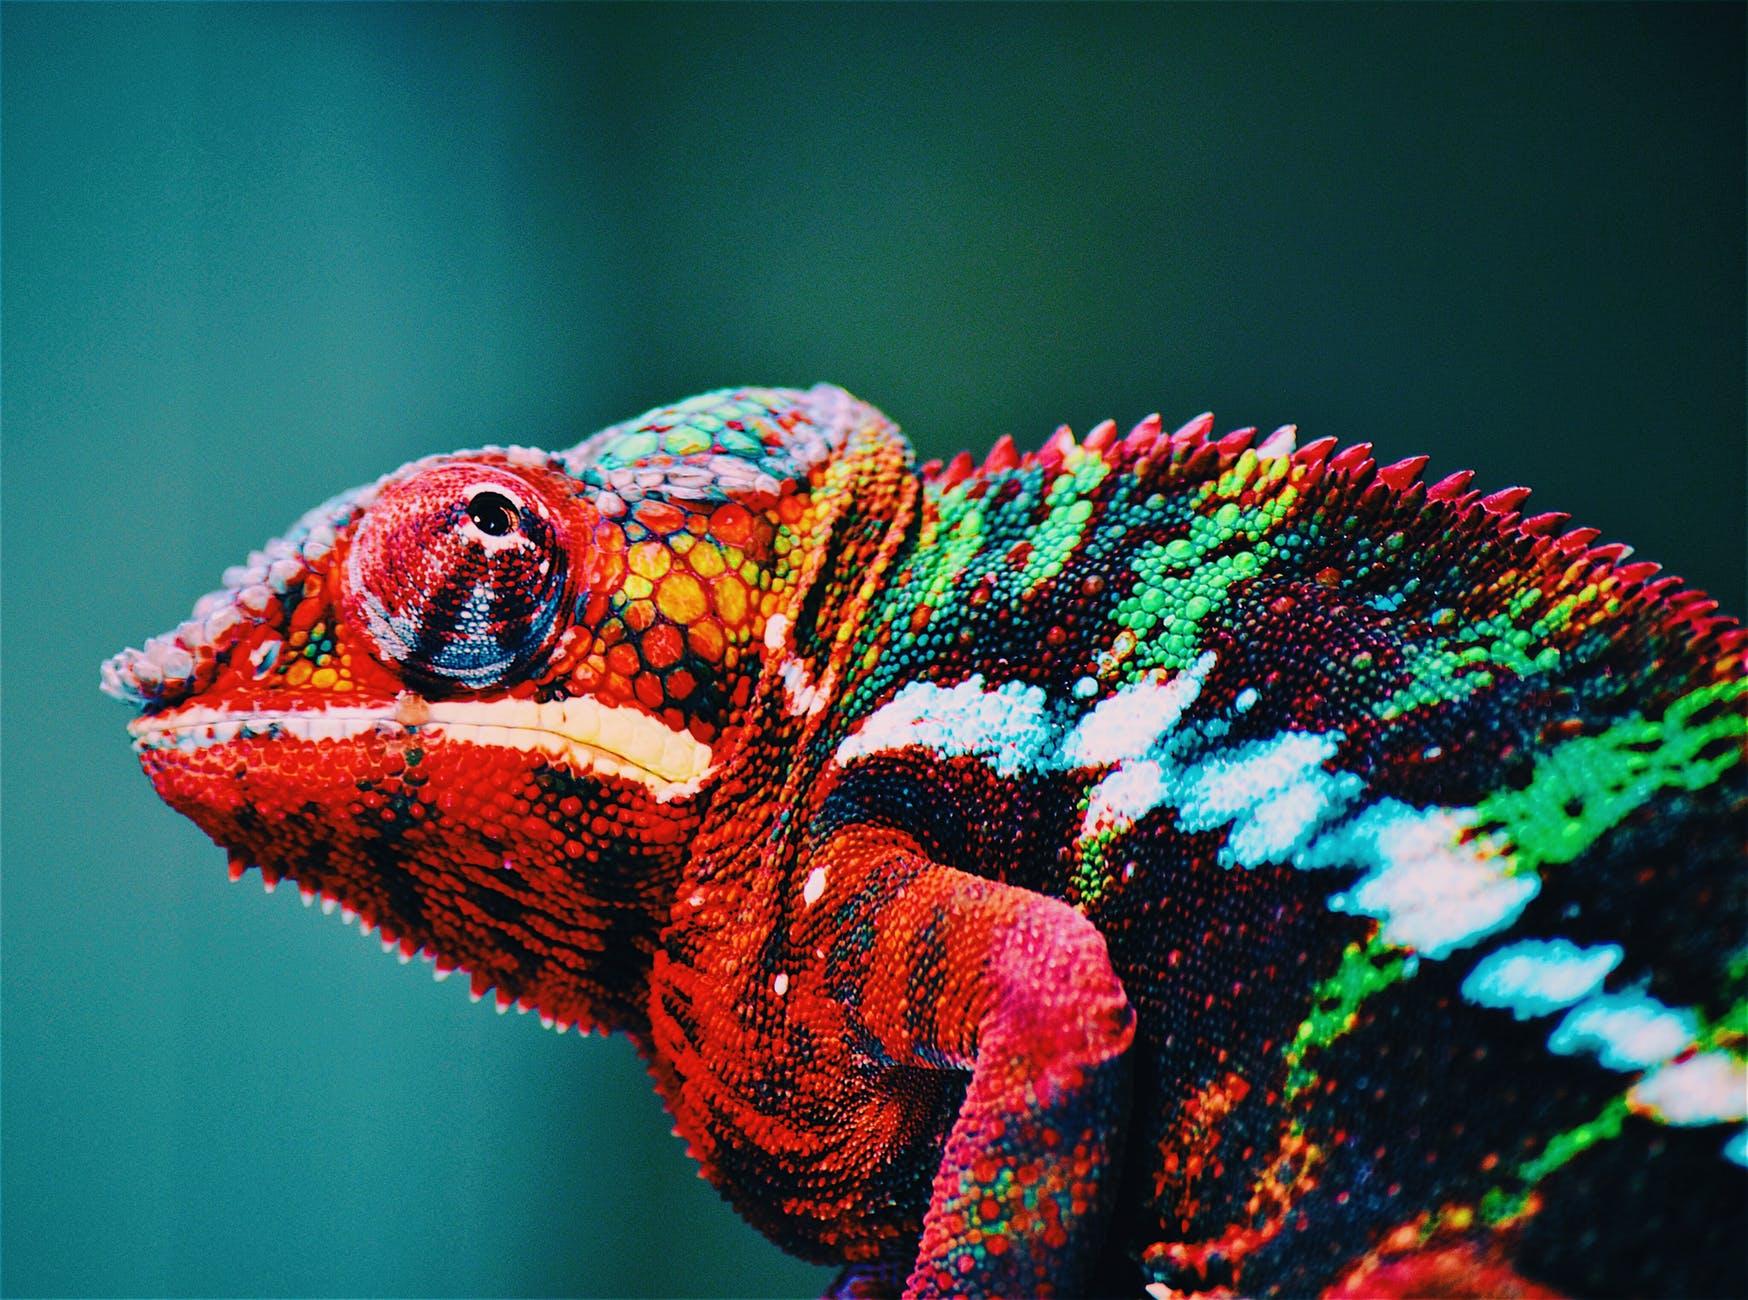 animal blur chameleon close up